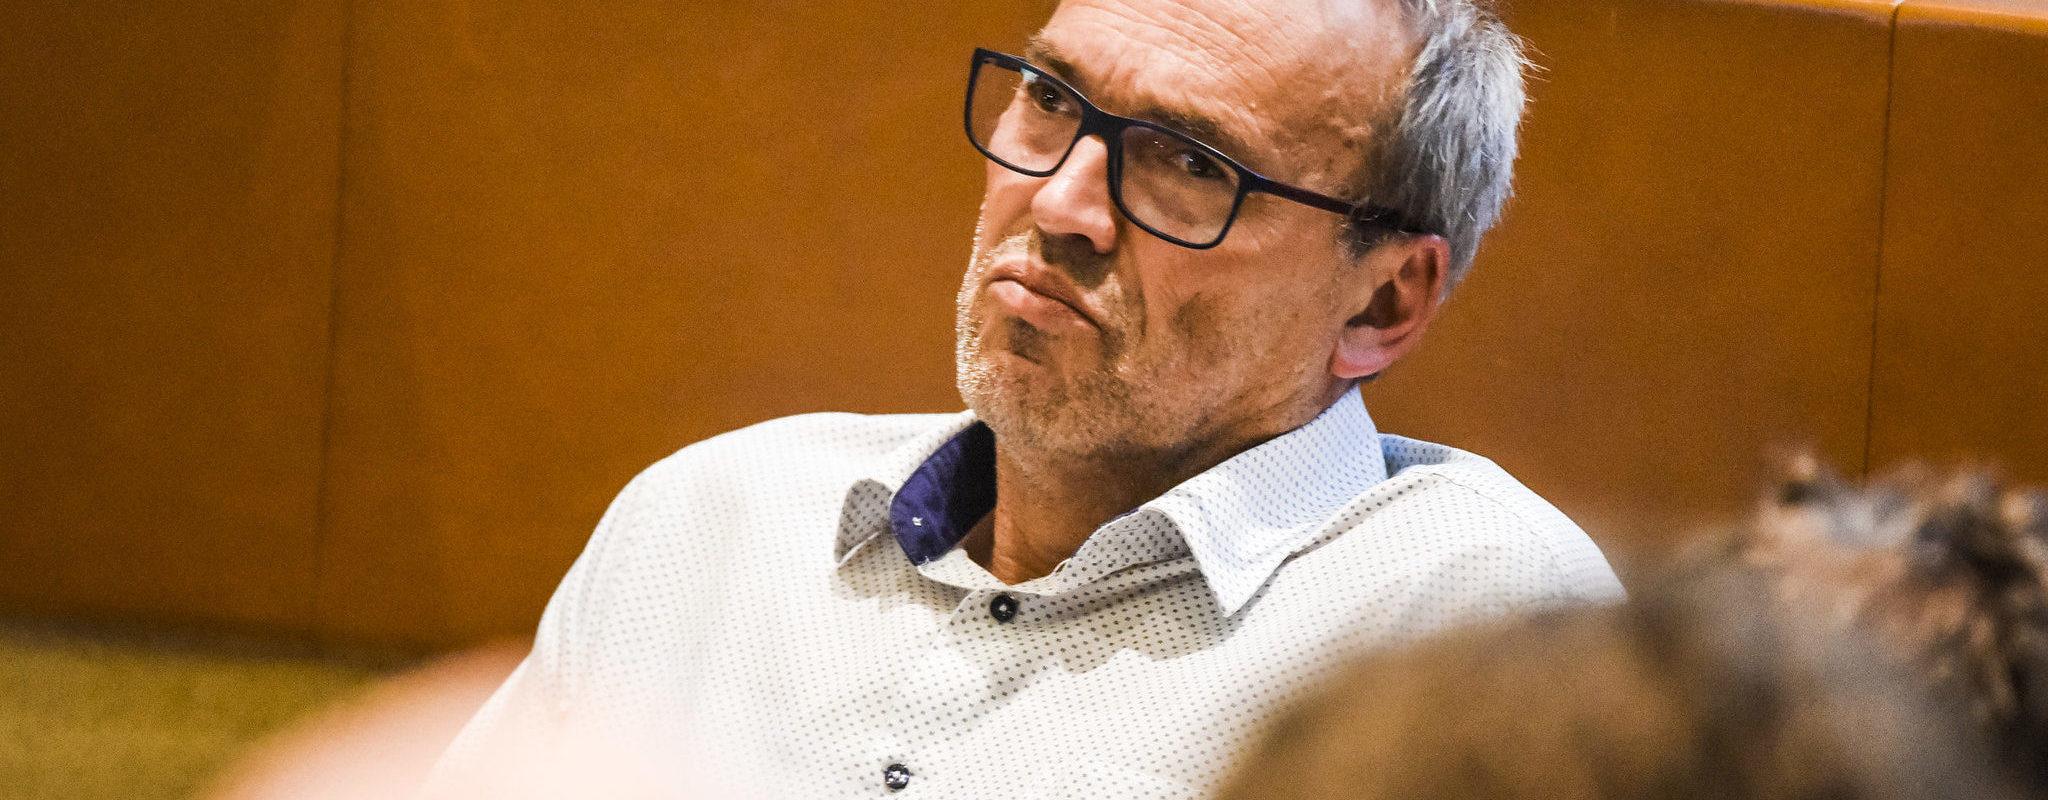 Municipales : Philippe Bies renonce, Mathieu Cahn candidat